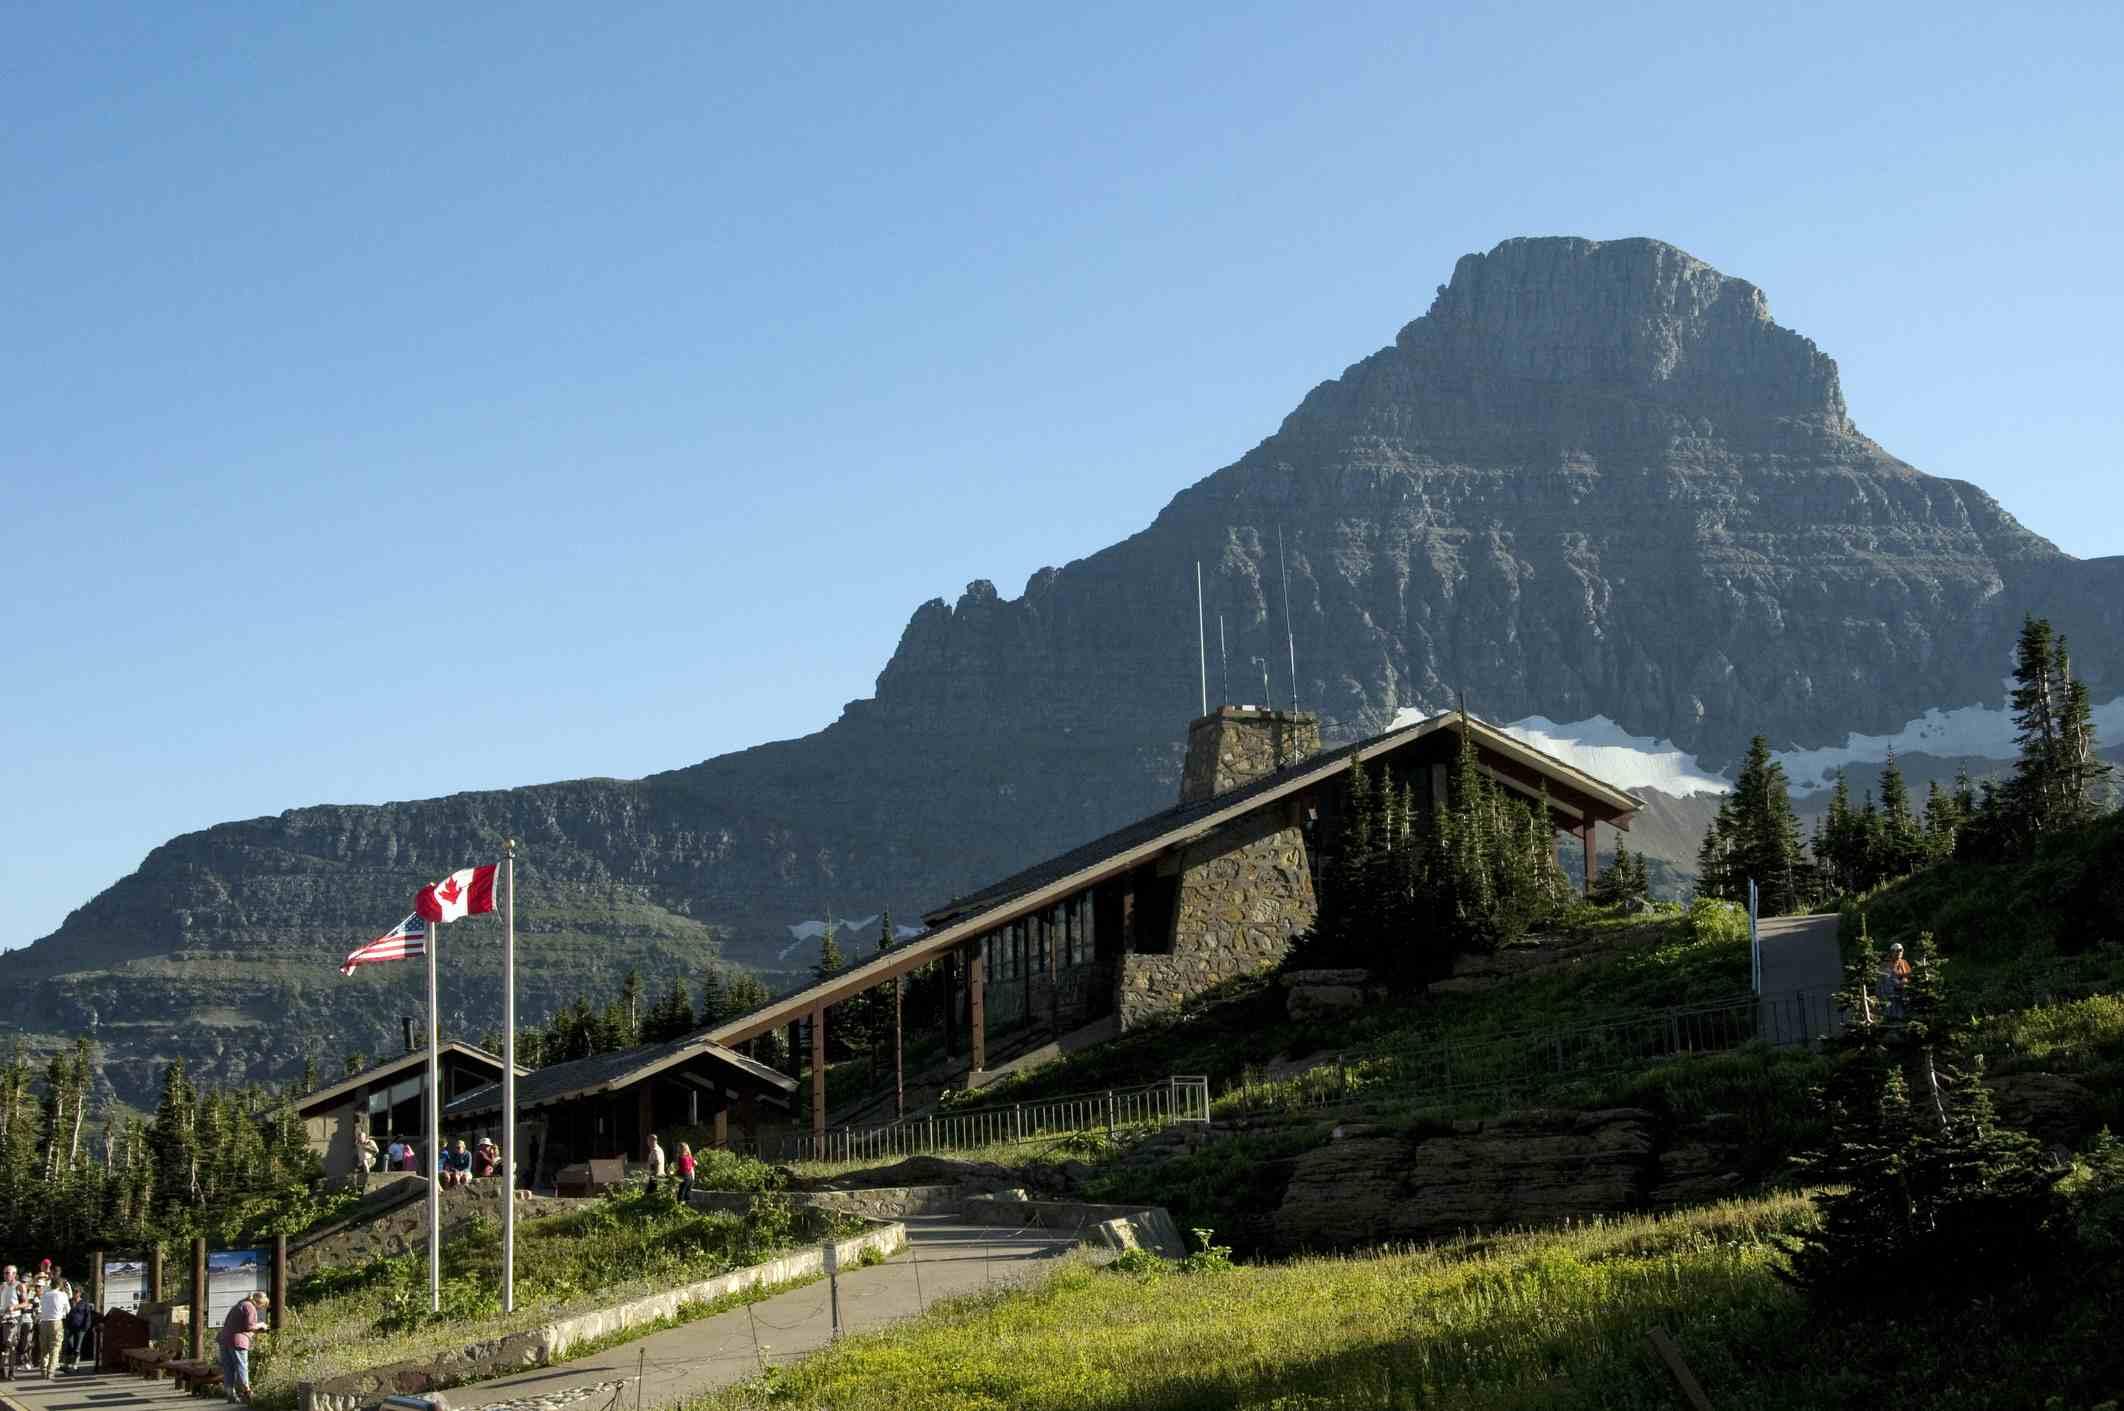 Visitor centre at Logan Pass, glacier national park